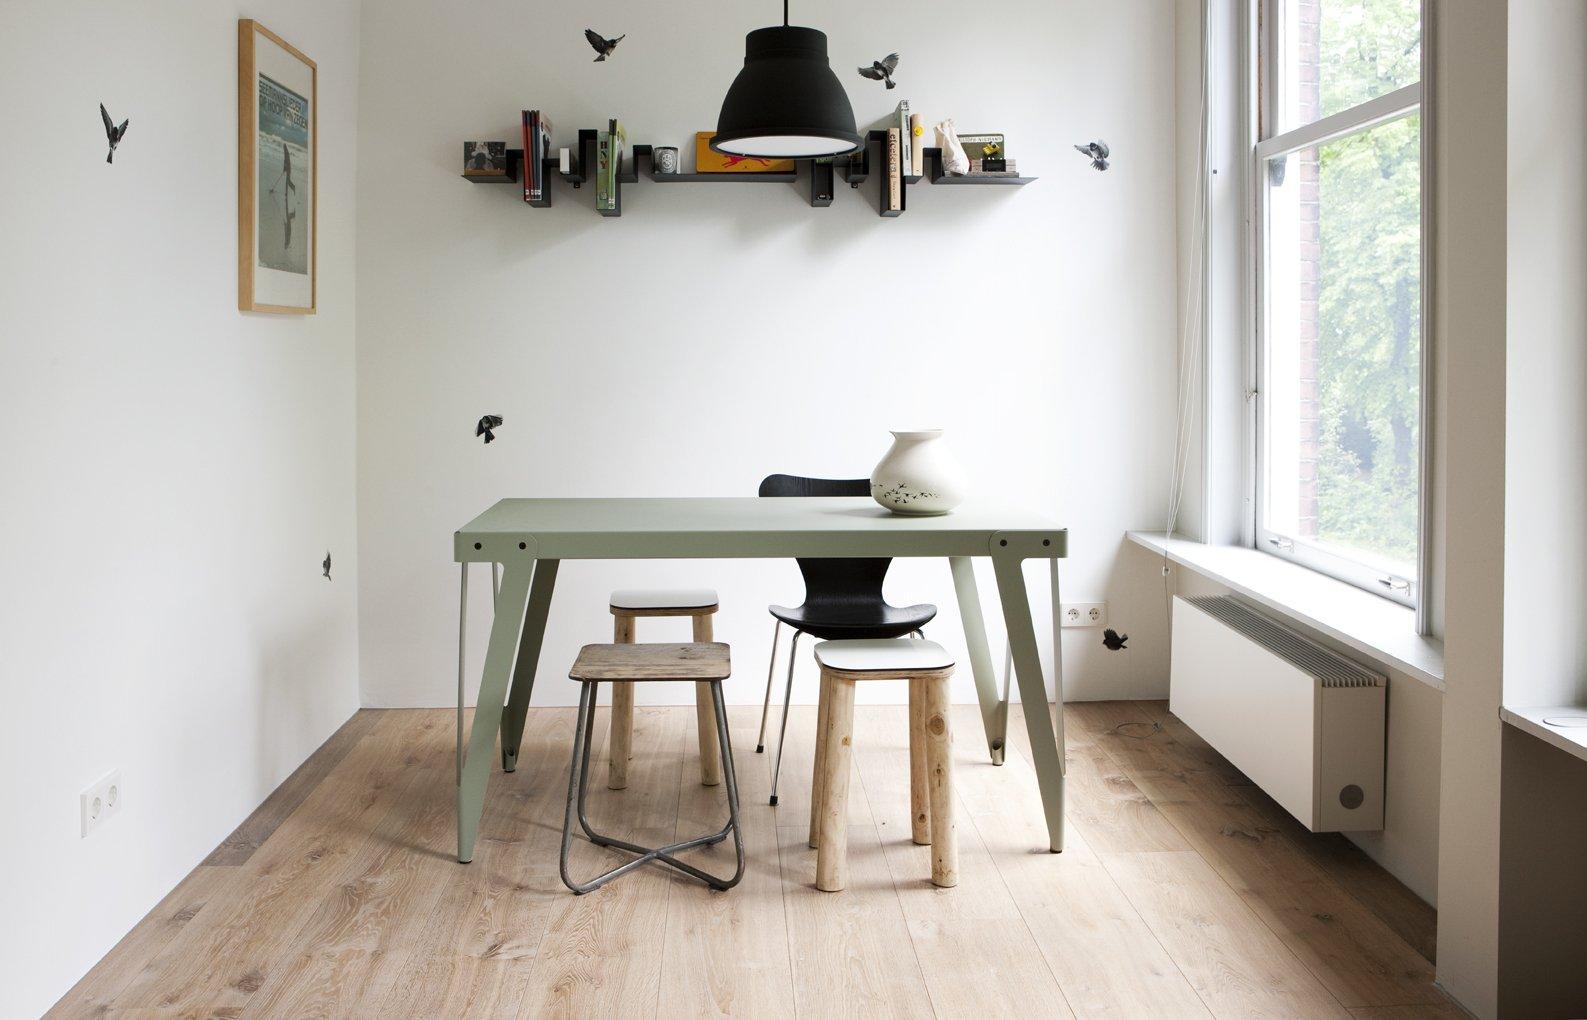 Eiken Keuken Welke Vloer : vloeren